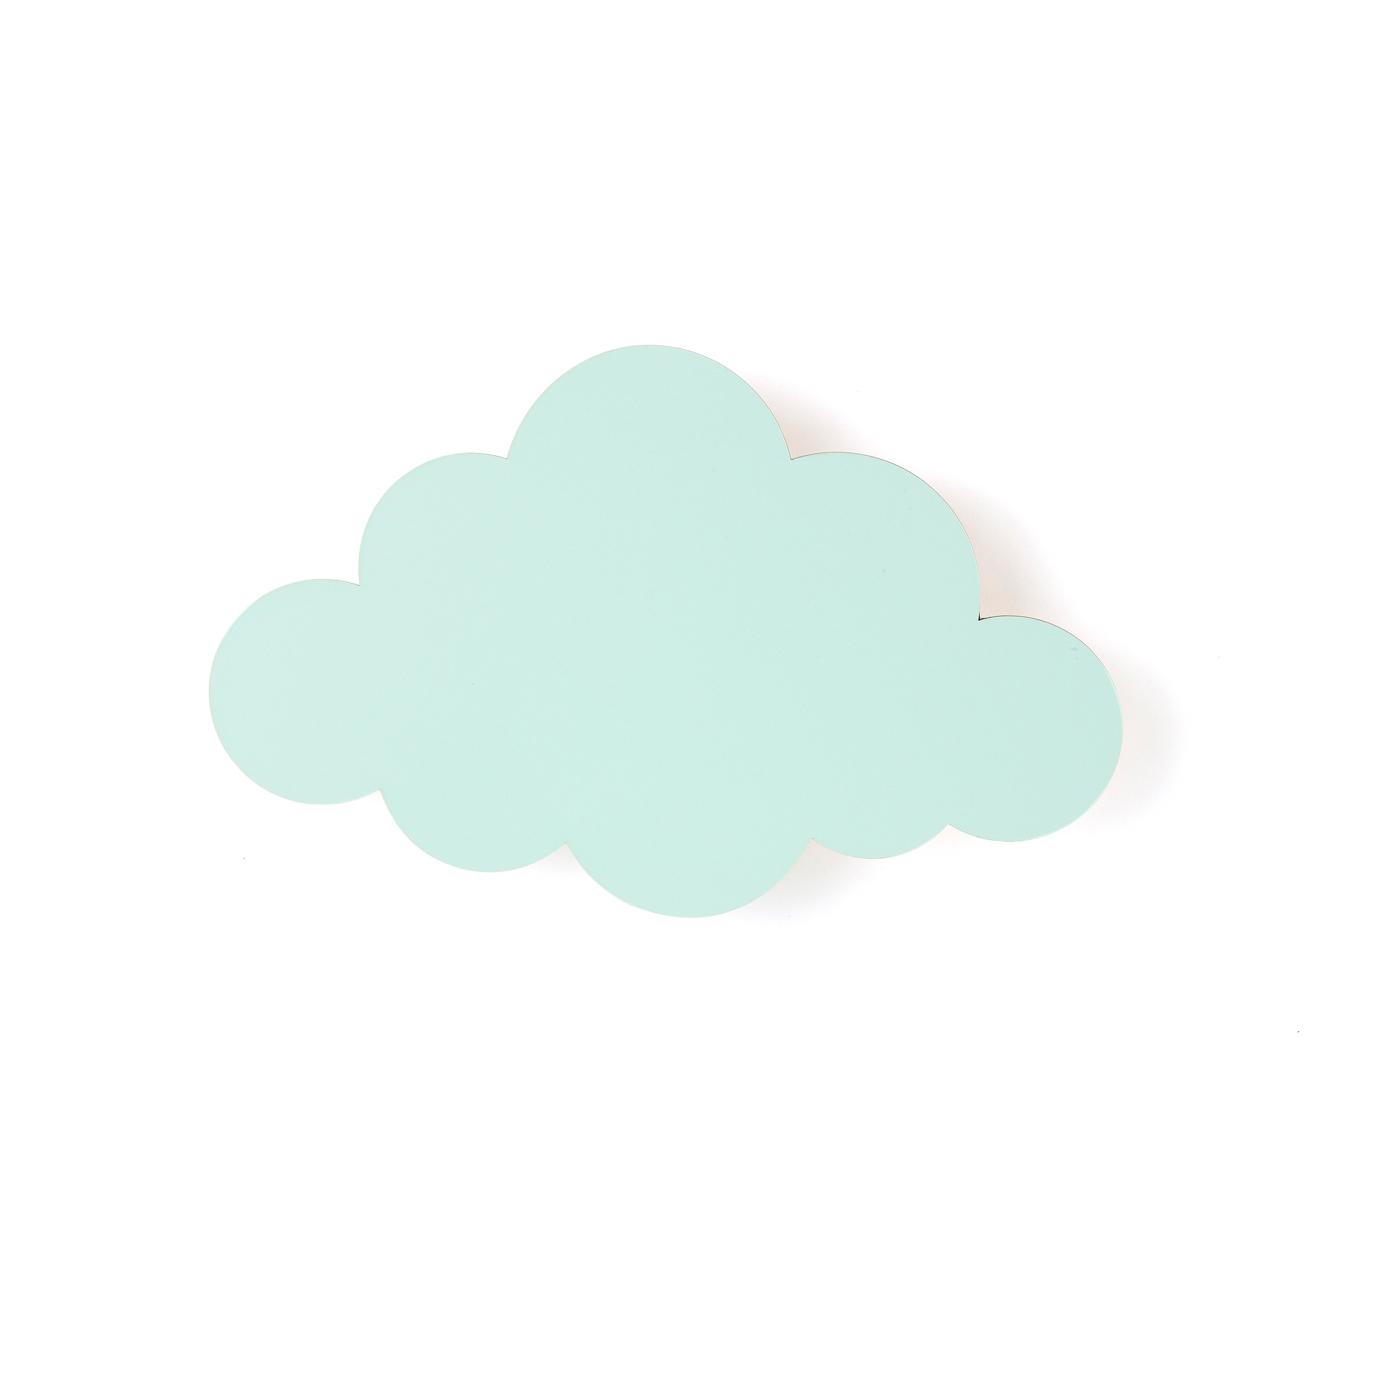 Barnlampa Cloud mint, Ferm Living